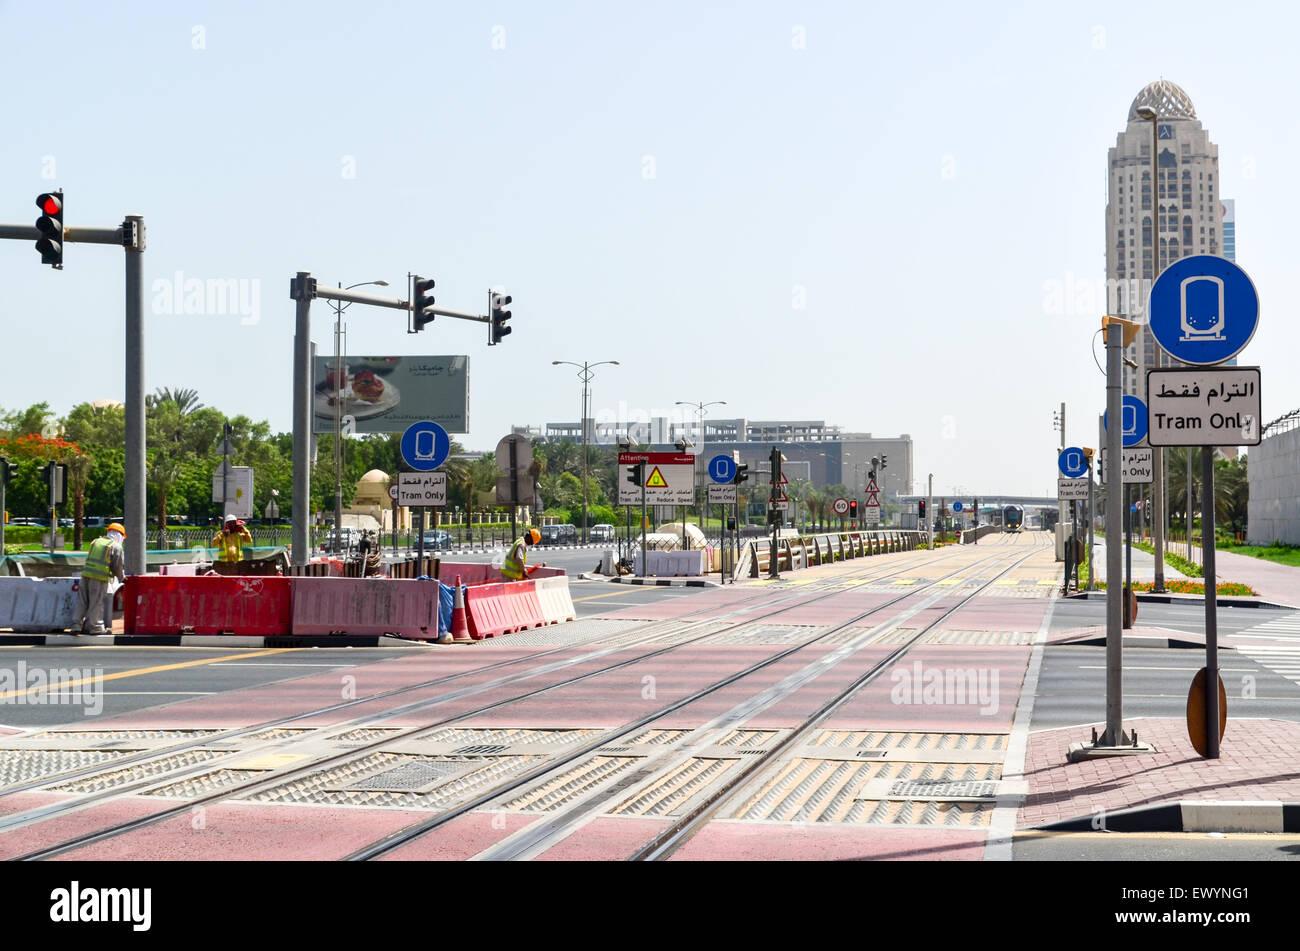 Tramway rails in Dubai, UAE - Stock Image